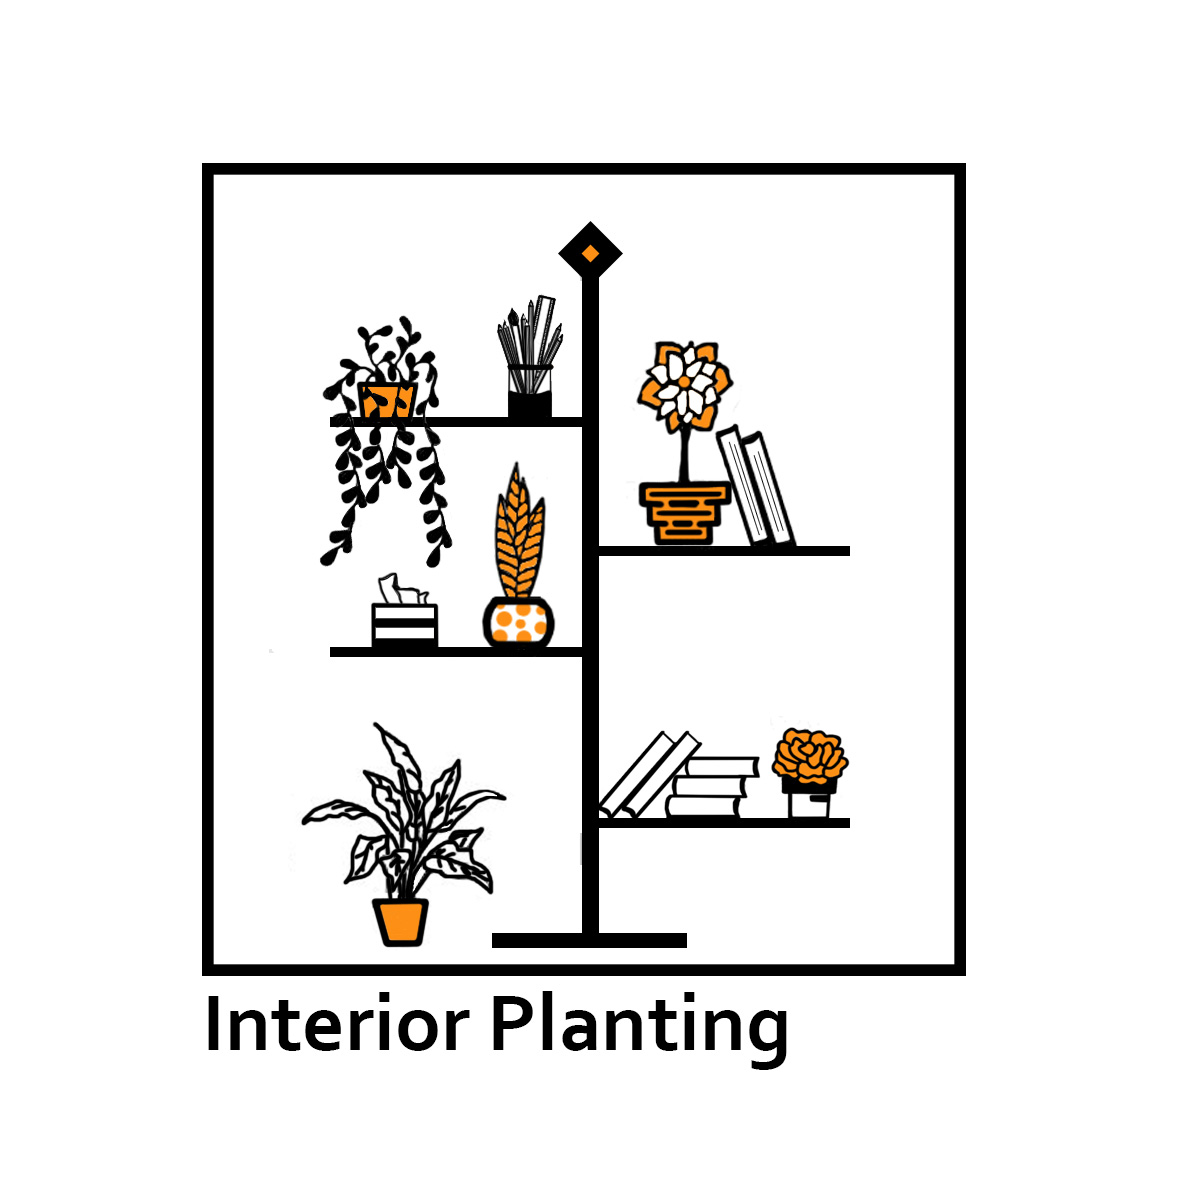 Interior Planting